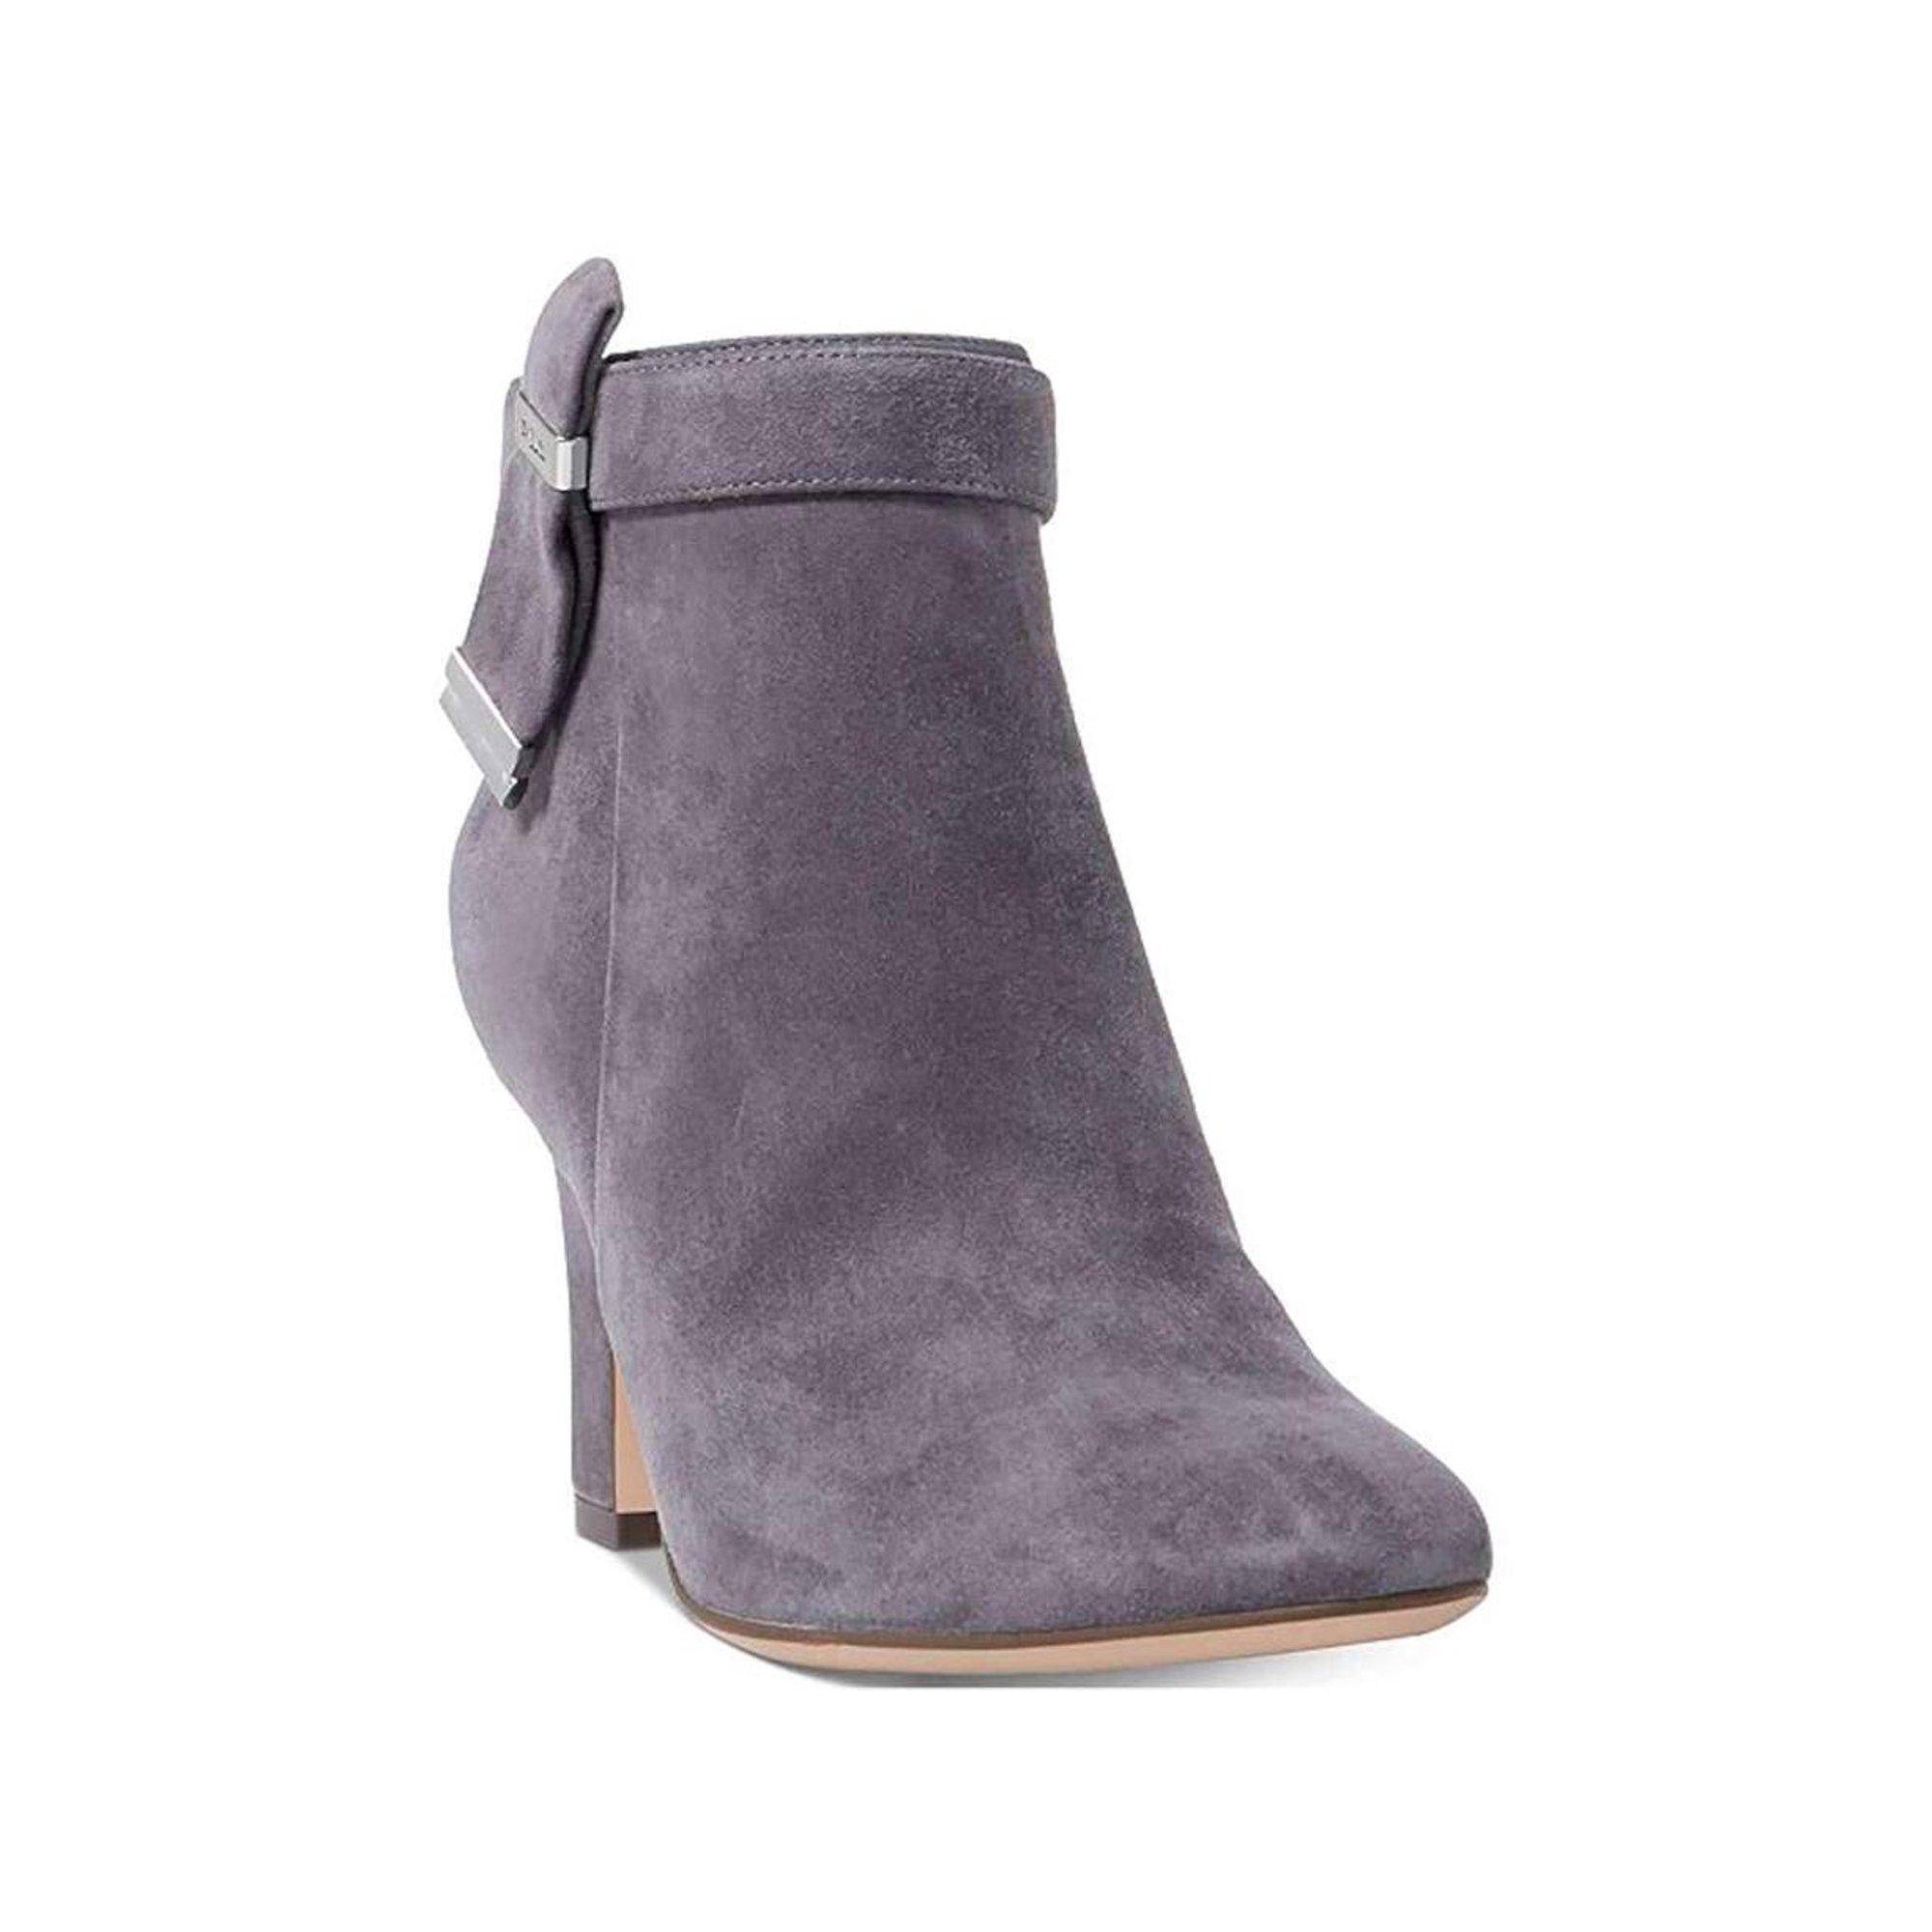 30cbc3868 LAUREN by Ralph Lauren Womens Brin Leather Closed Toe Ankle | Walmart Canada